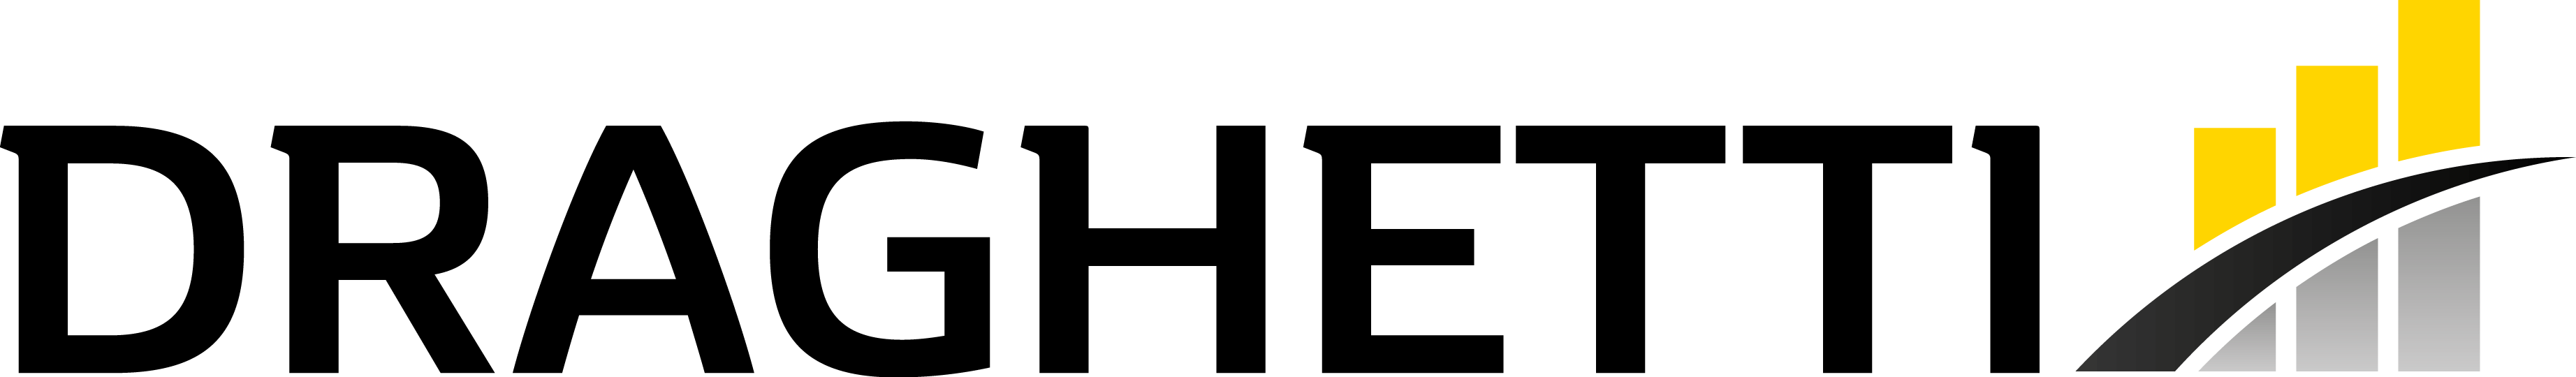 Logo DRAGHETTI SRL